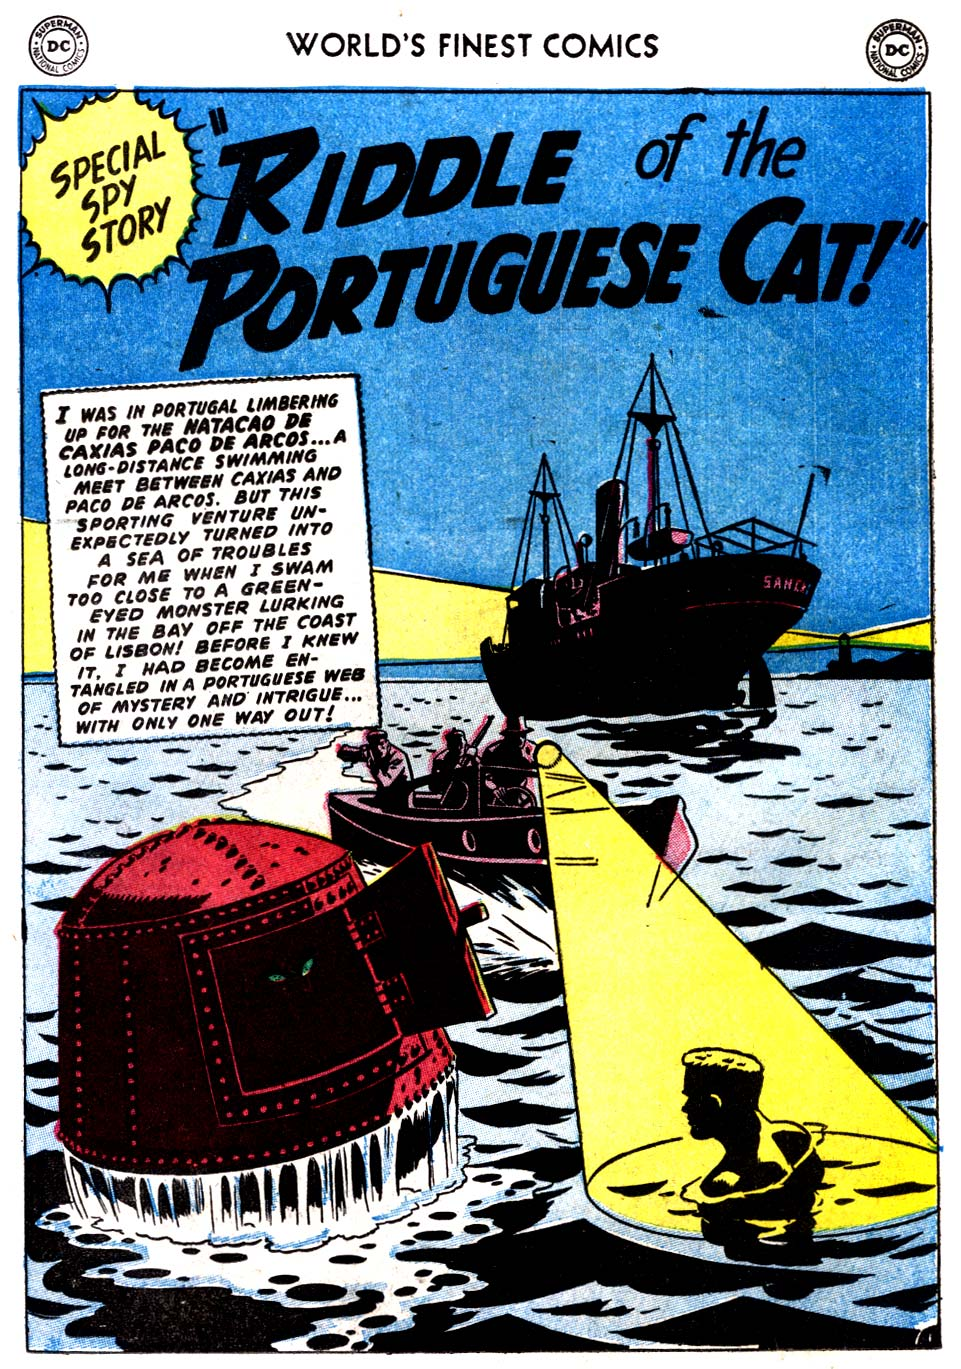 Read online World's Finest Comics comic -  Issue #68 - 43